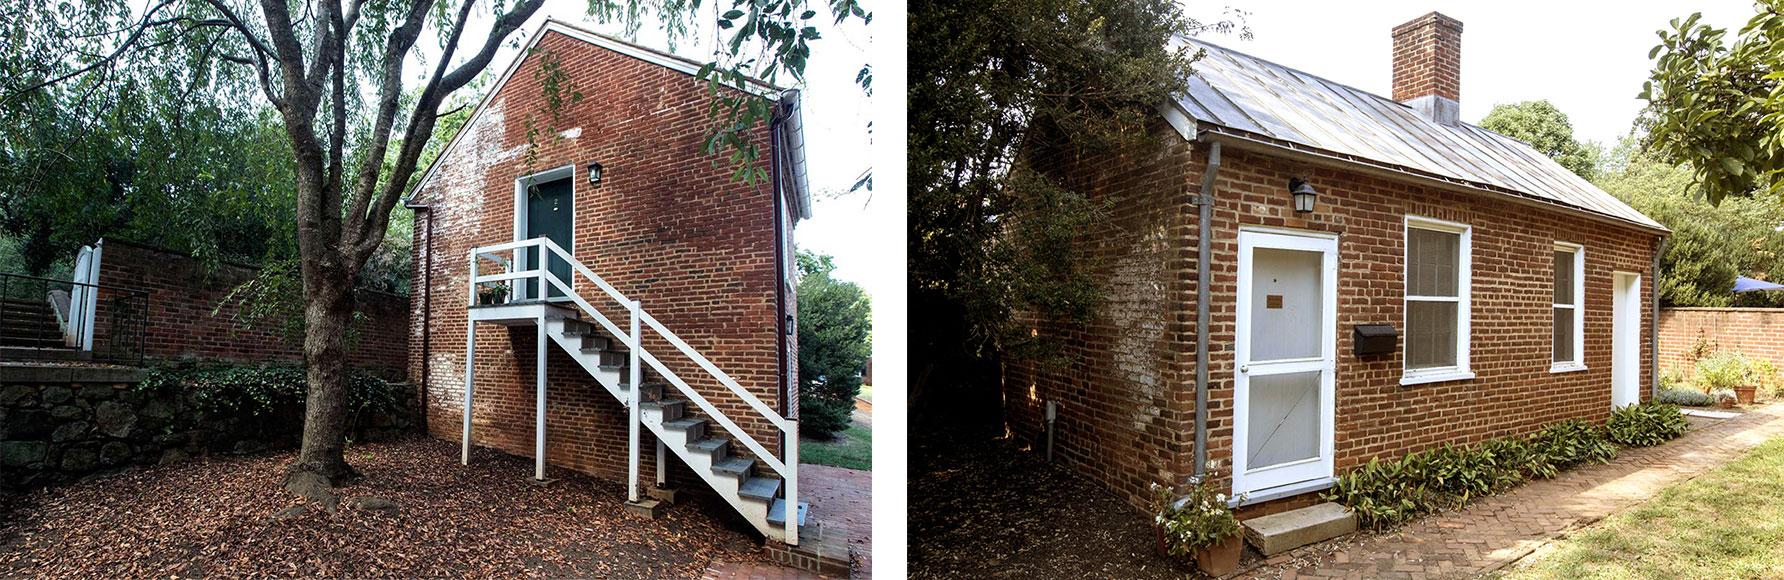 The Crackerbox and McGuffey Cottage (Photos by Dan Addison, University Communications)